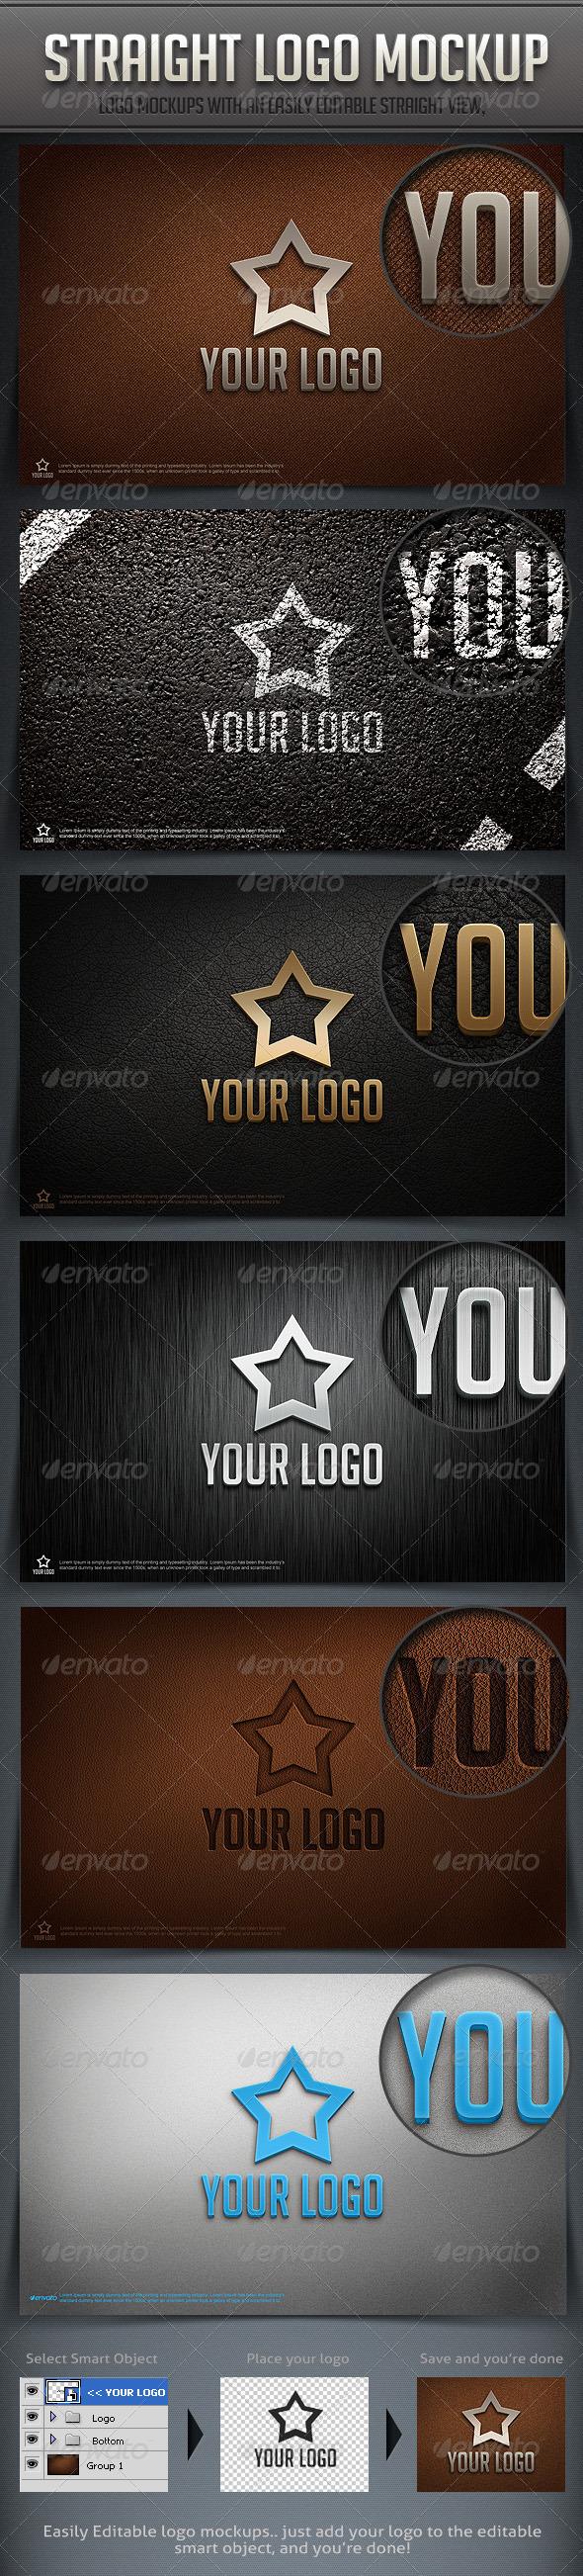 Straight Logo Mockup - Logo Product Mock-Ups